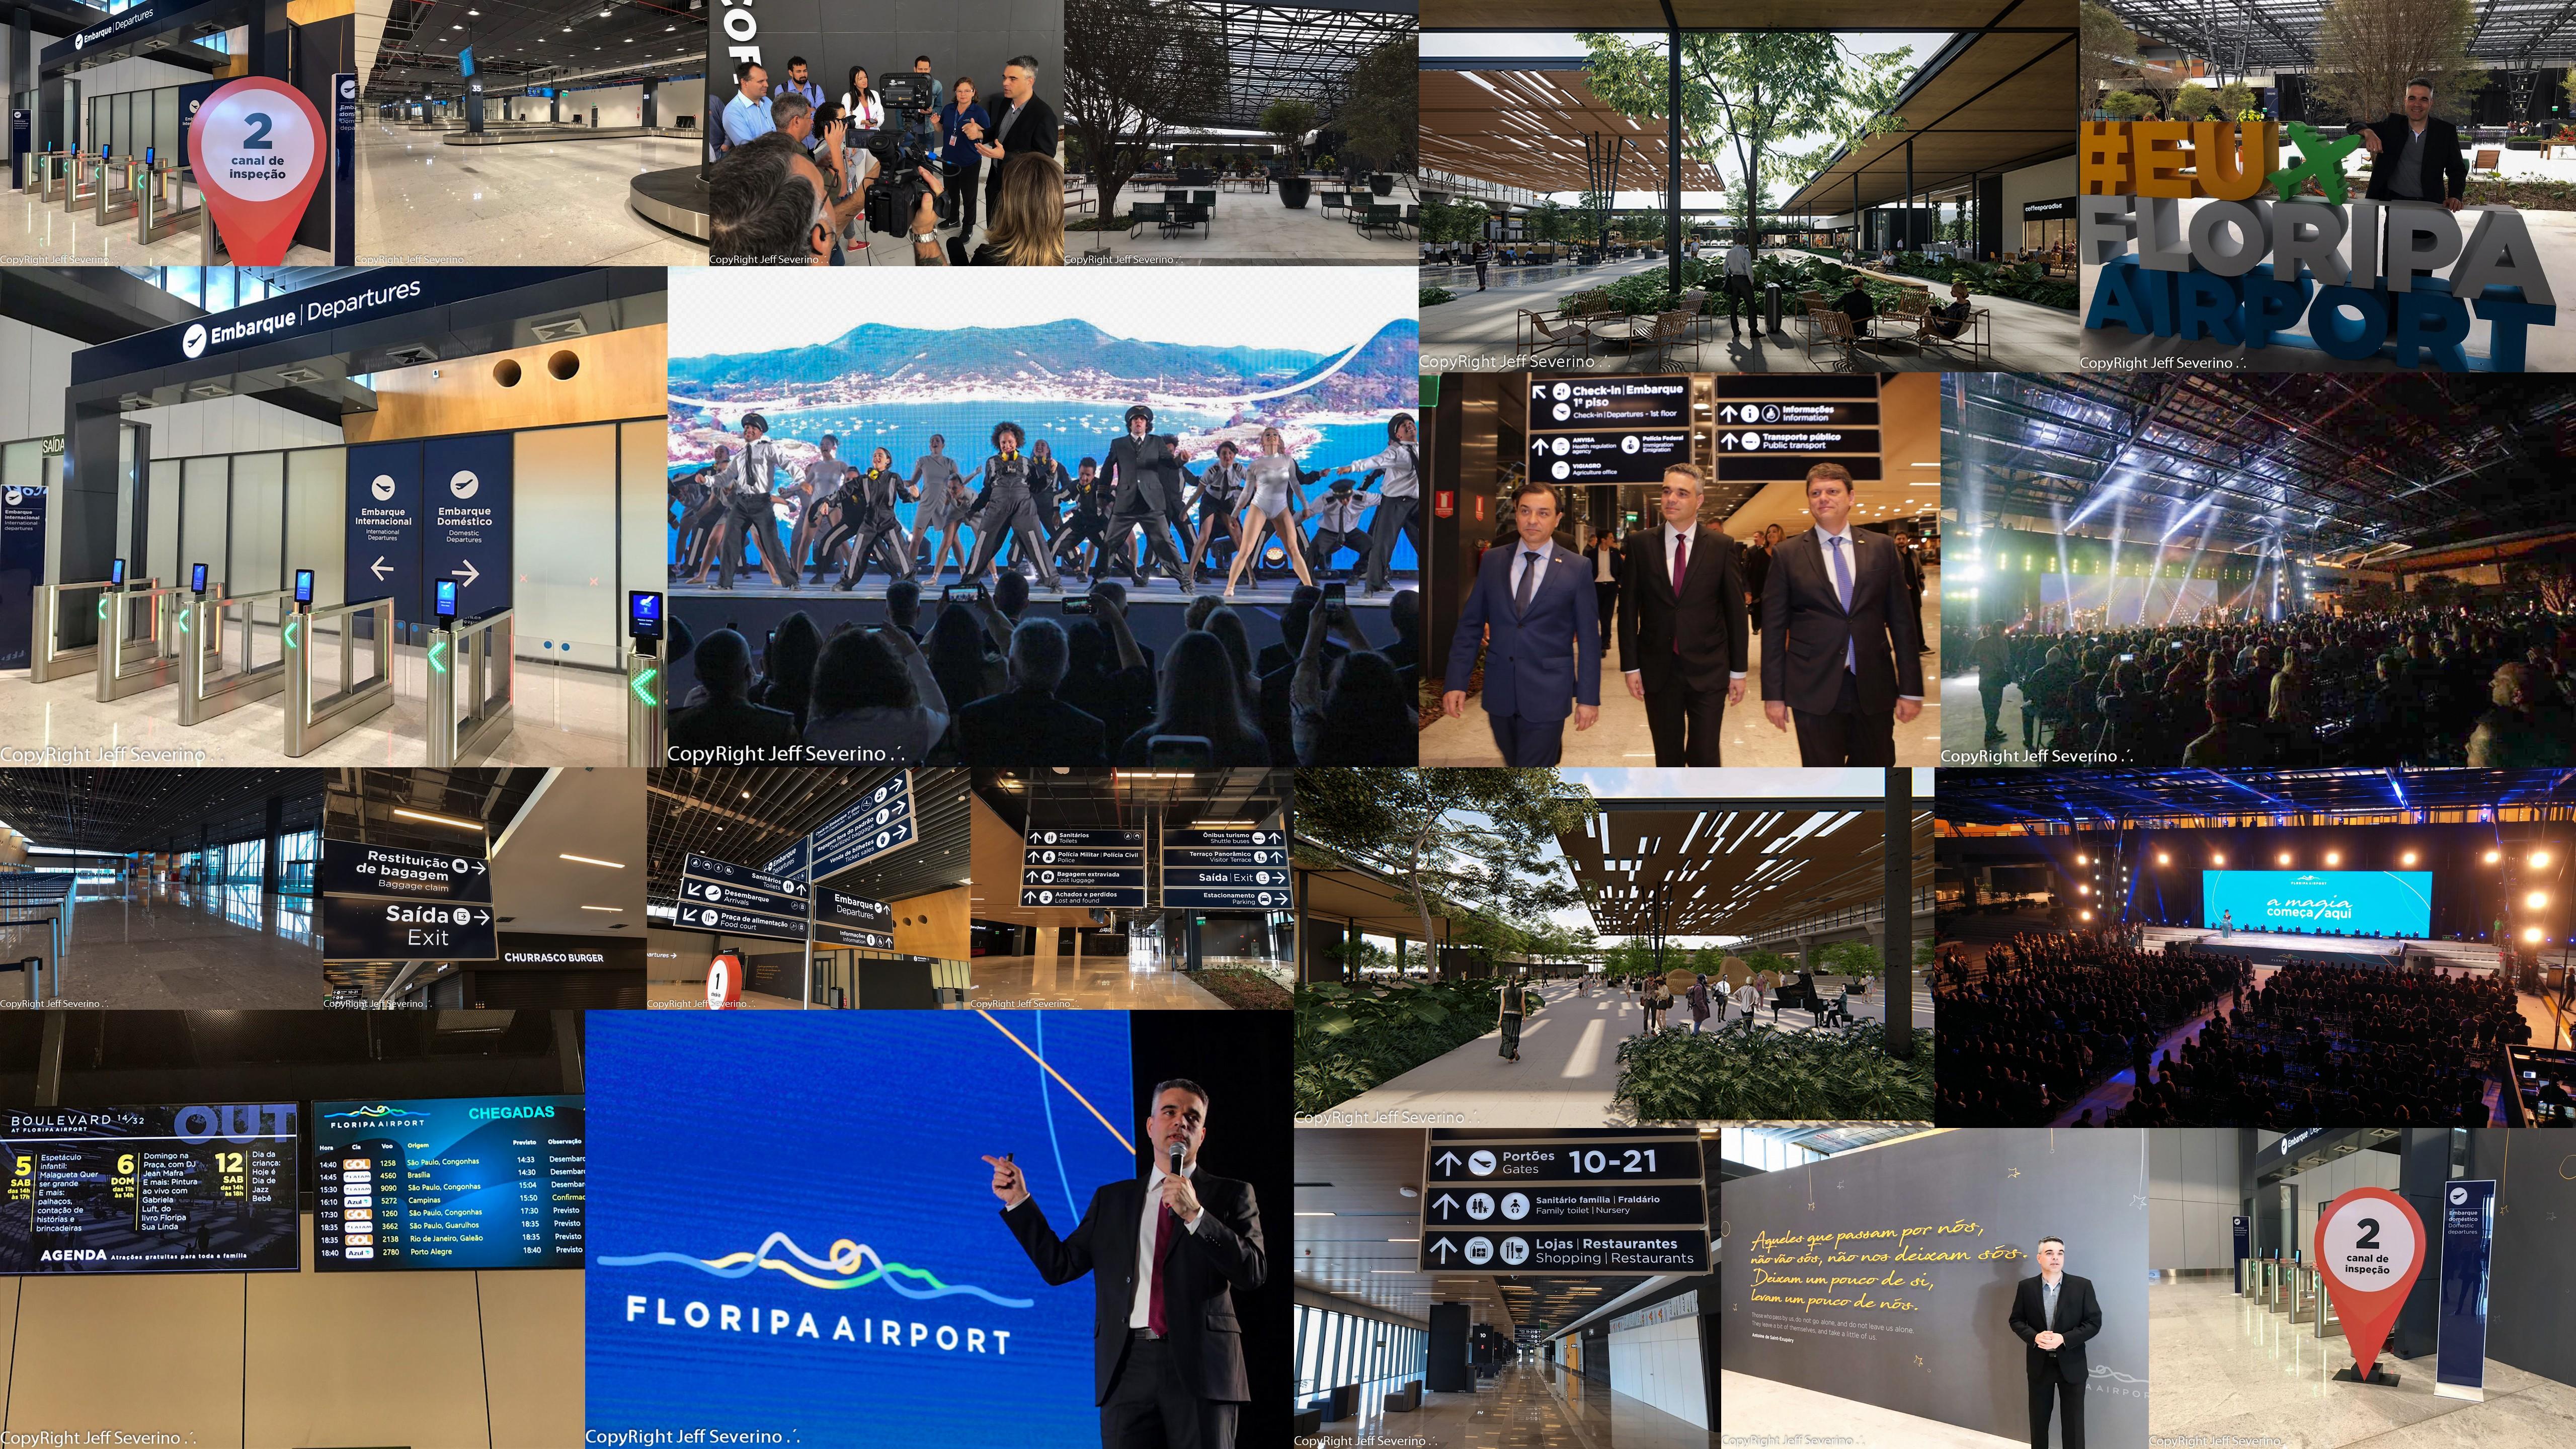 Novo marco para Florianópolis. Froripa passa a ter um aeroporto internacional de verdade